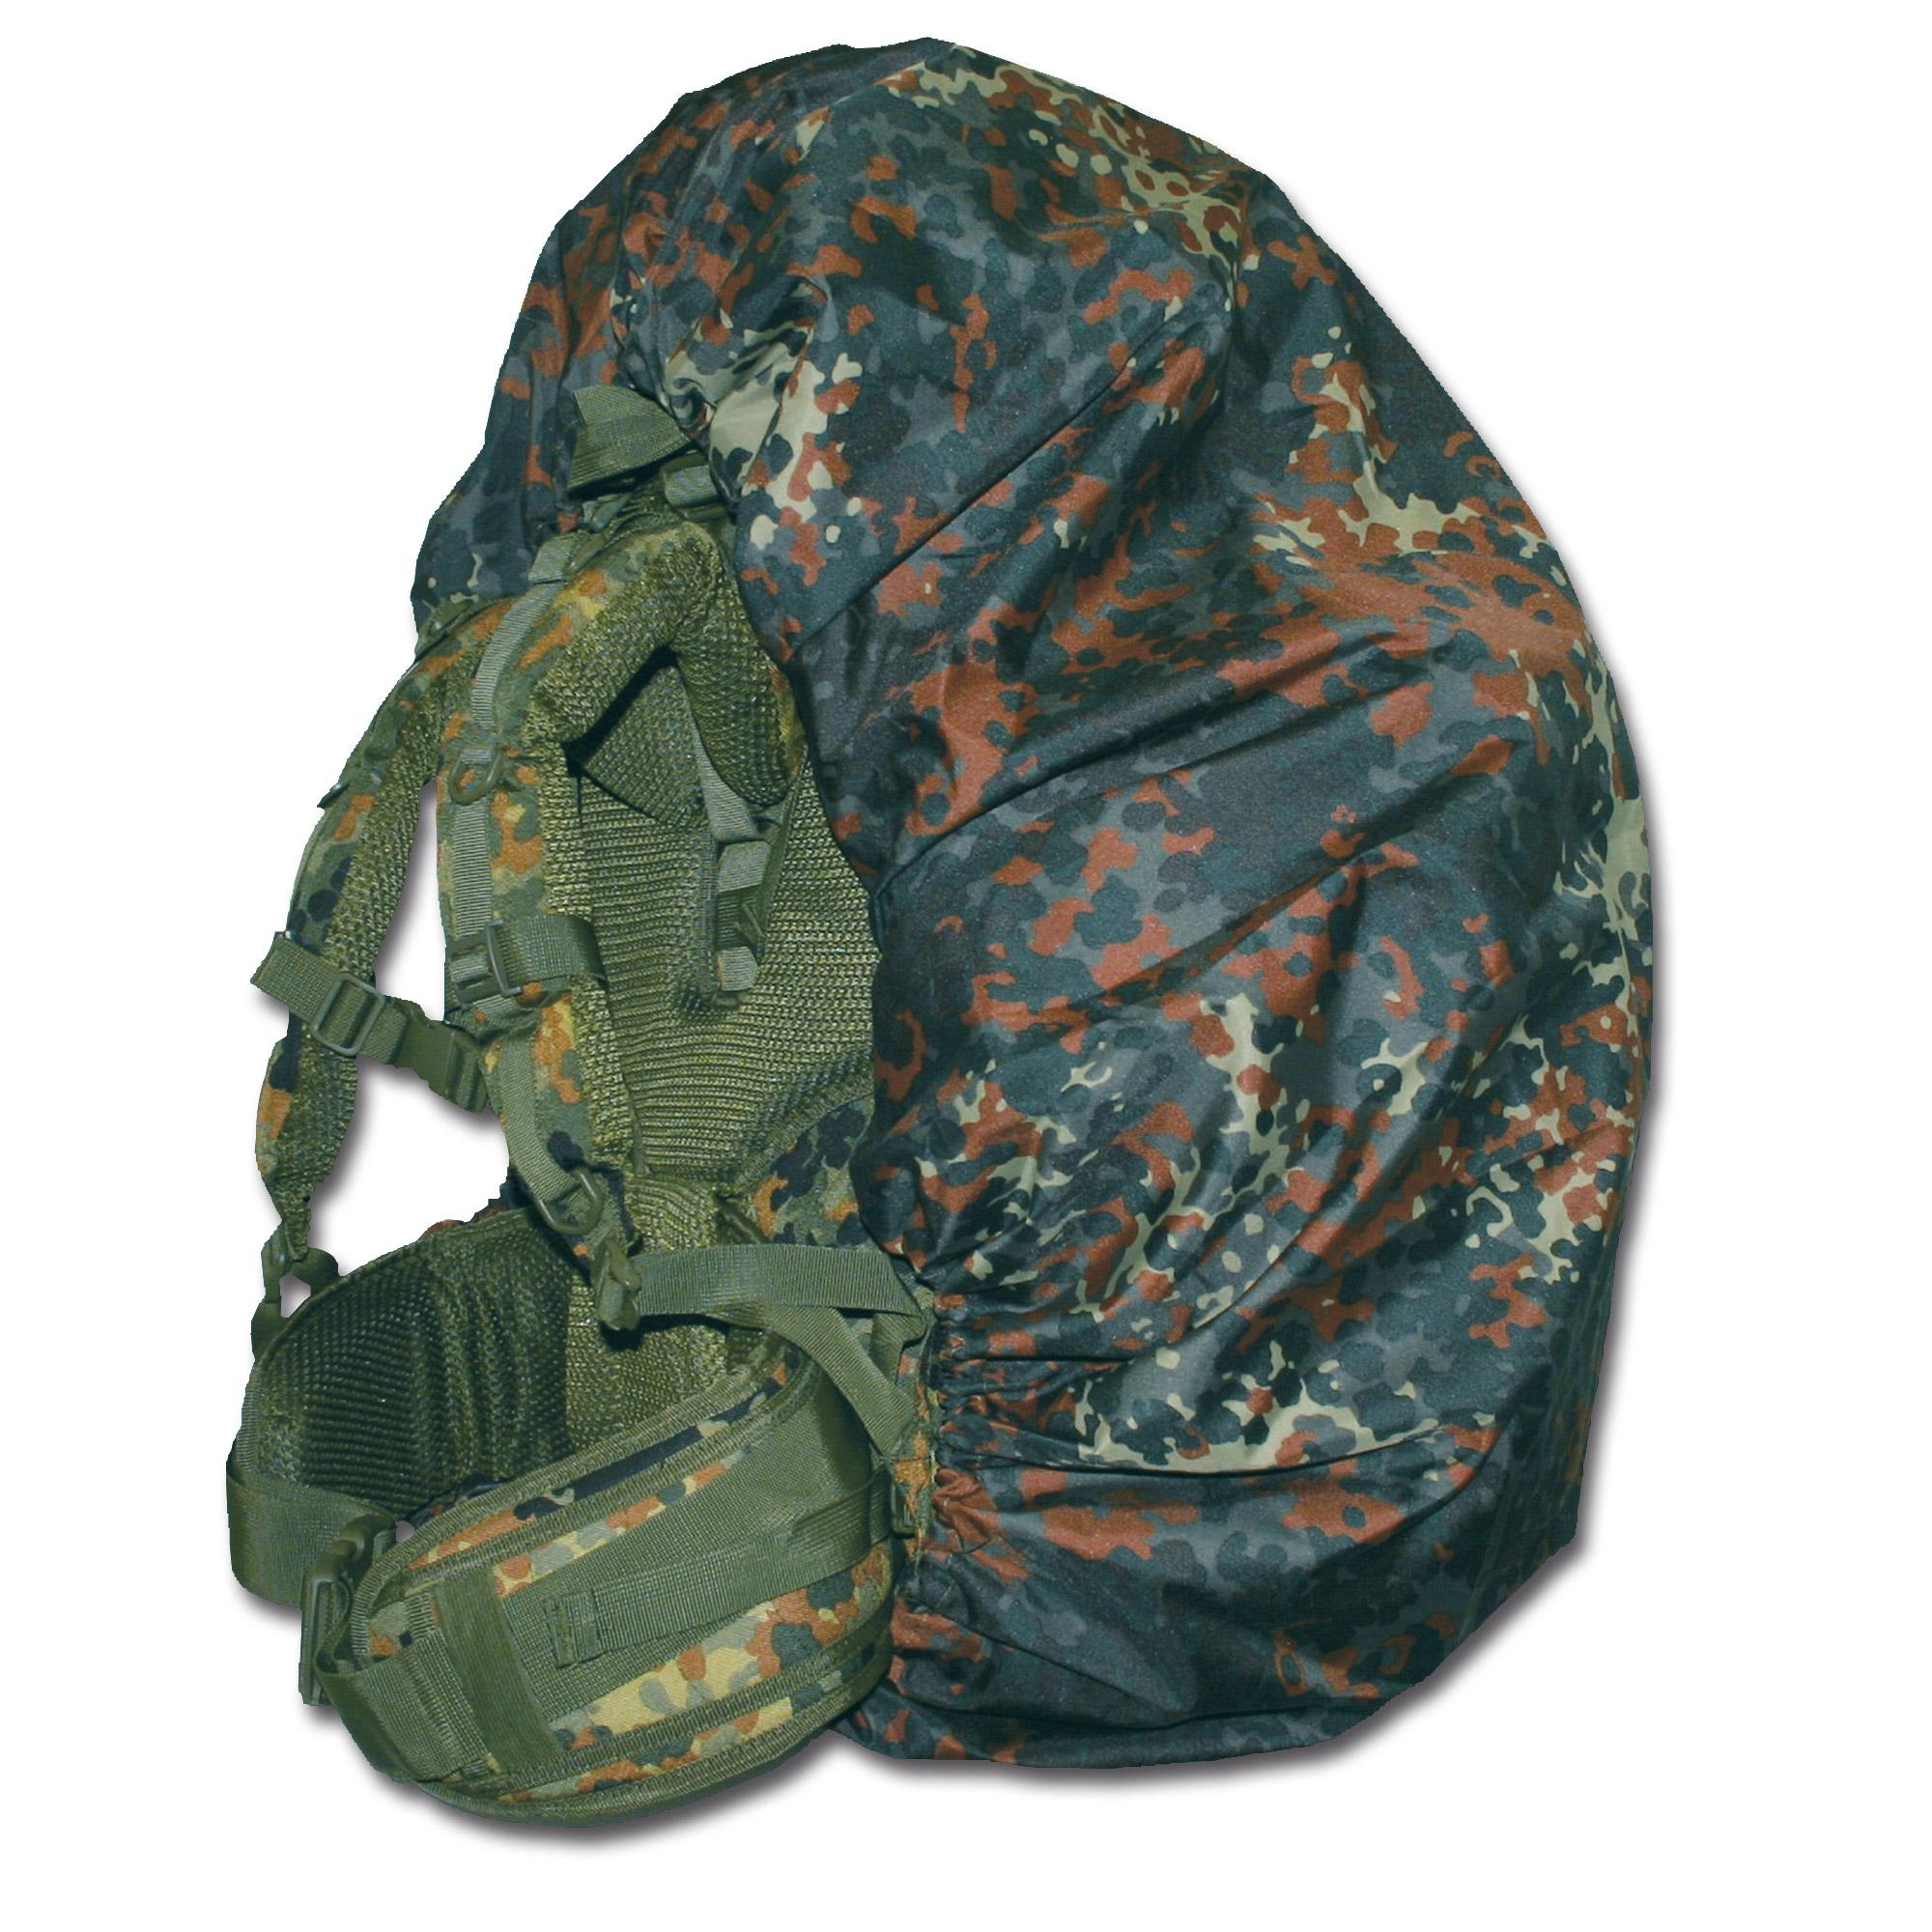 Backpack Cover TacGear flecktarn